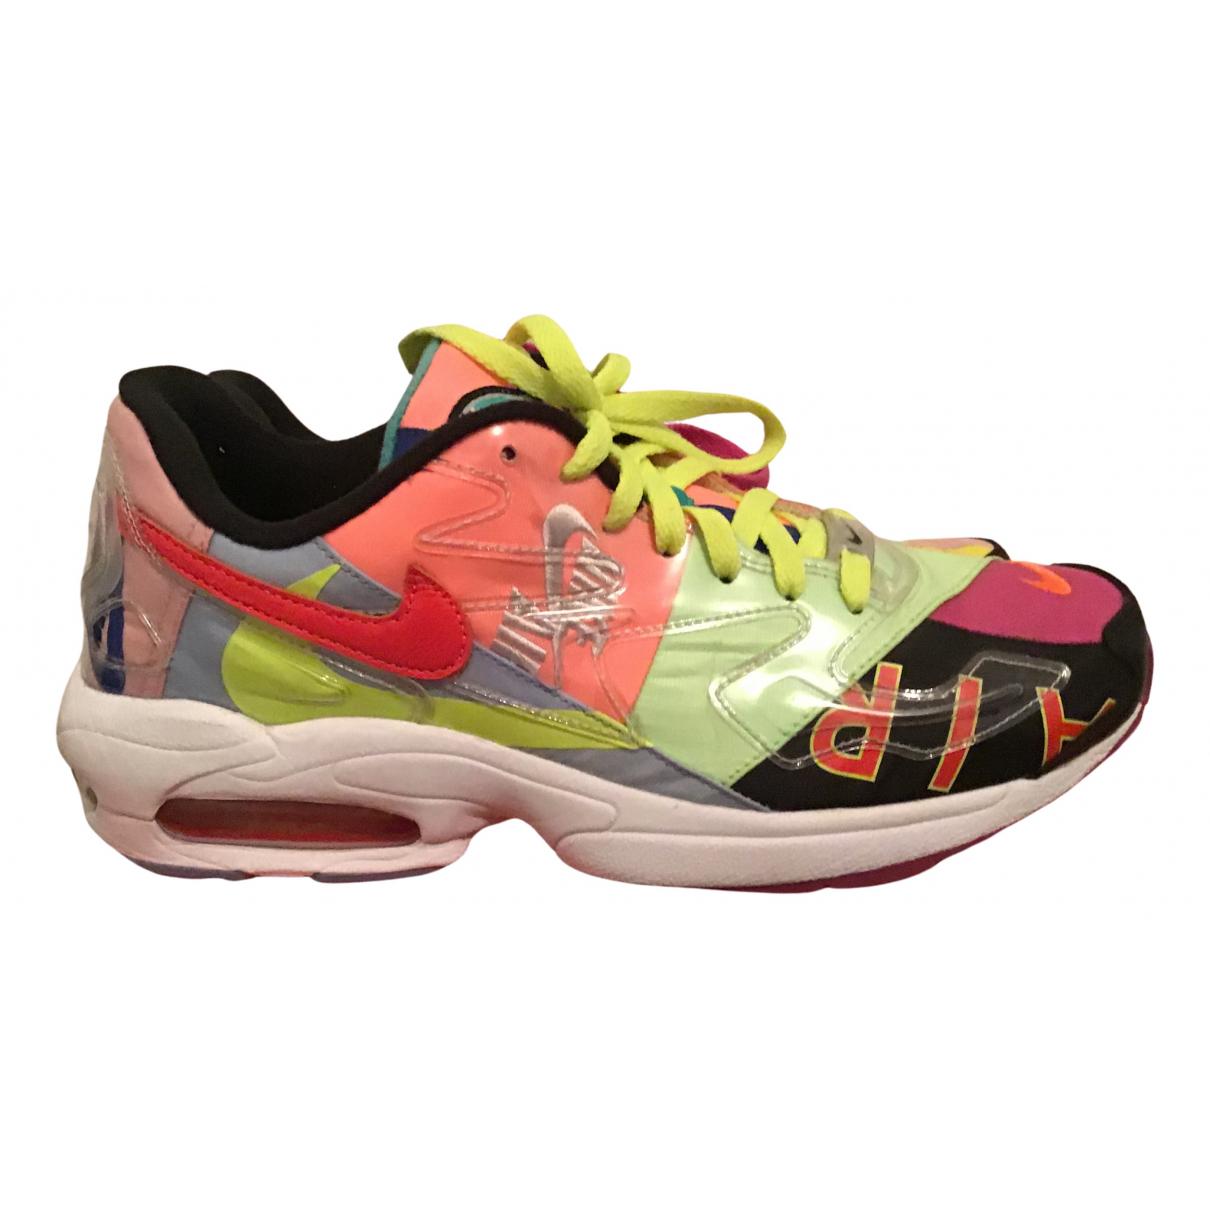 Nike X Atmos - Baskets Air Max 2 Light pour homme en cuir - multicolore